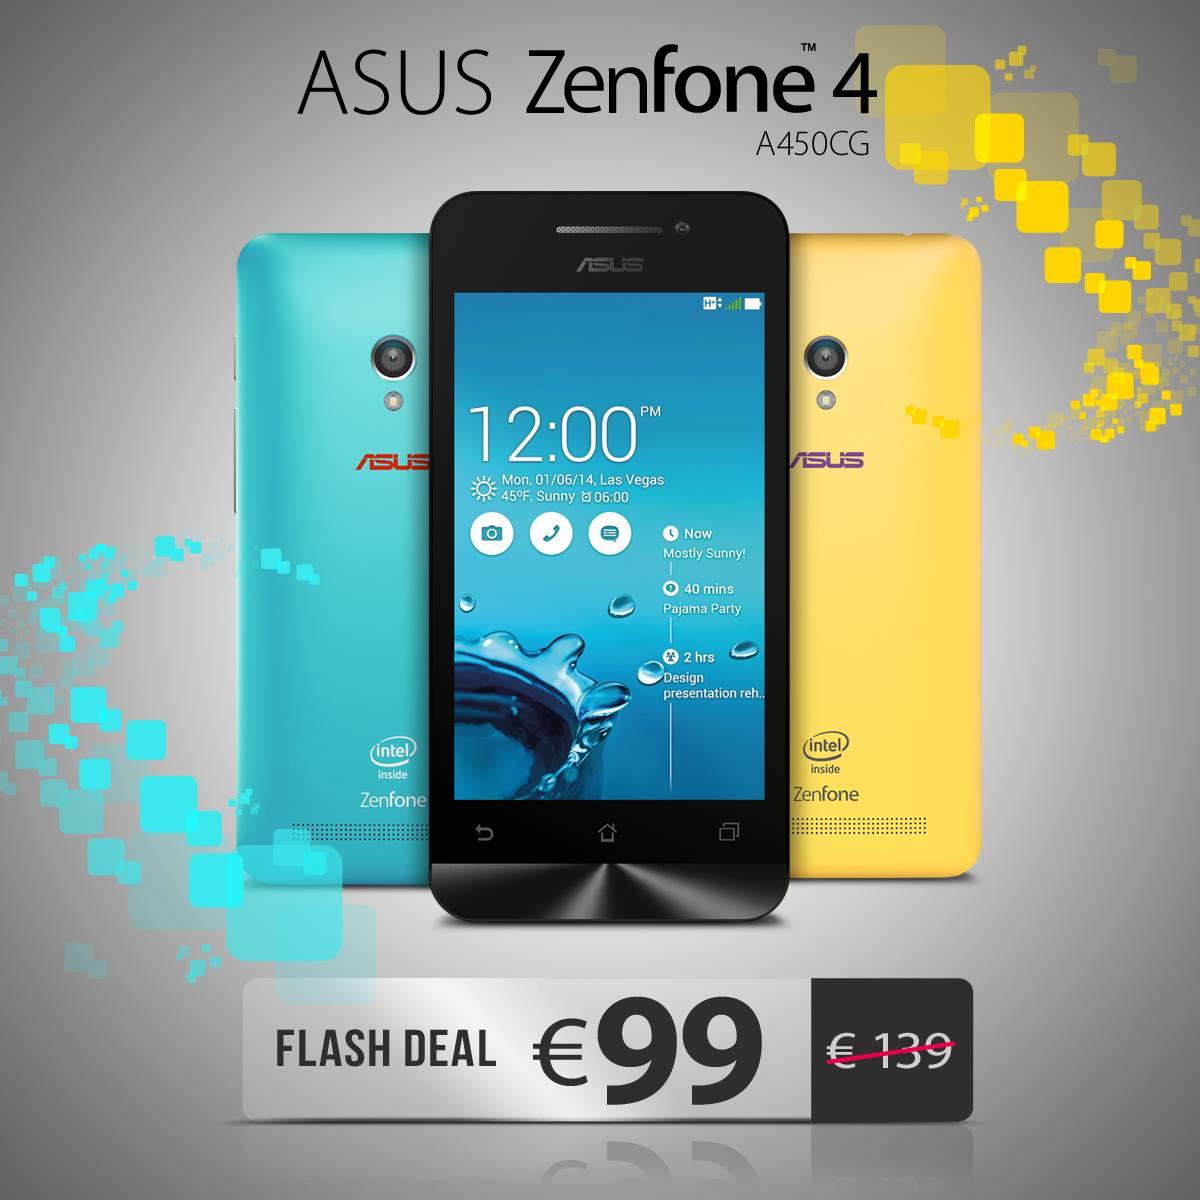 ASUS ZenFone 4 offerta